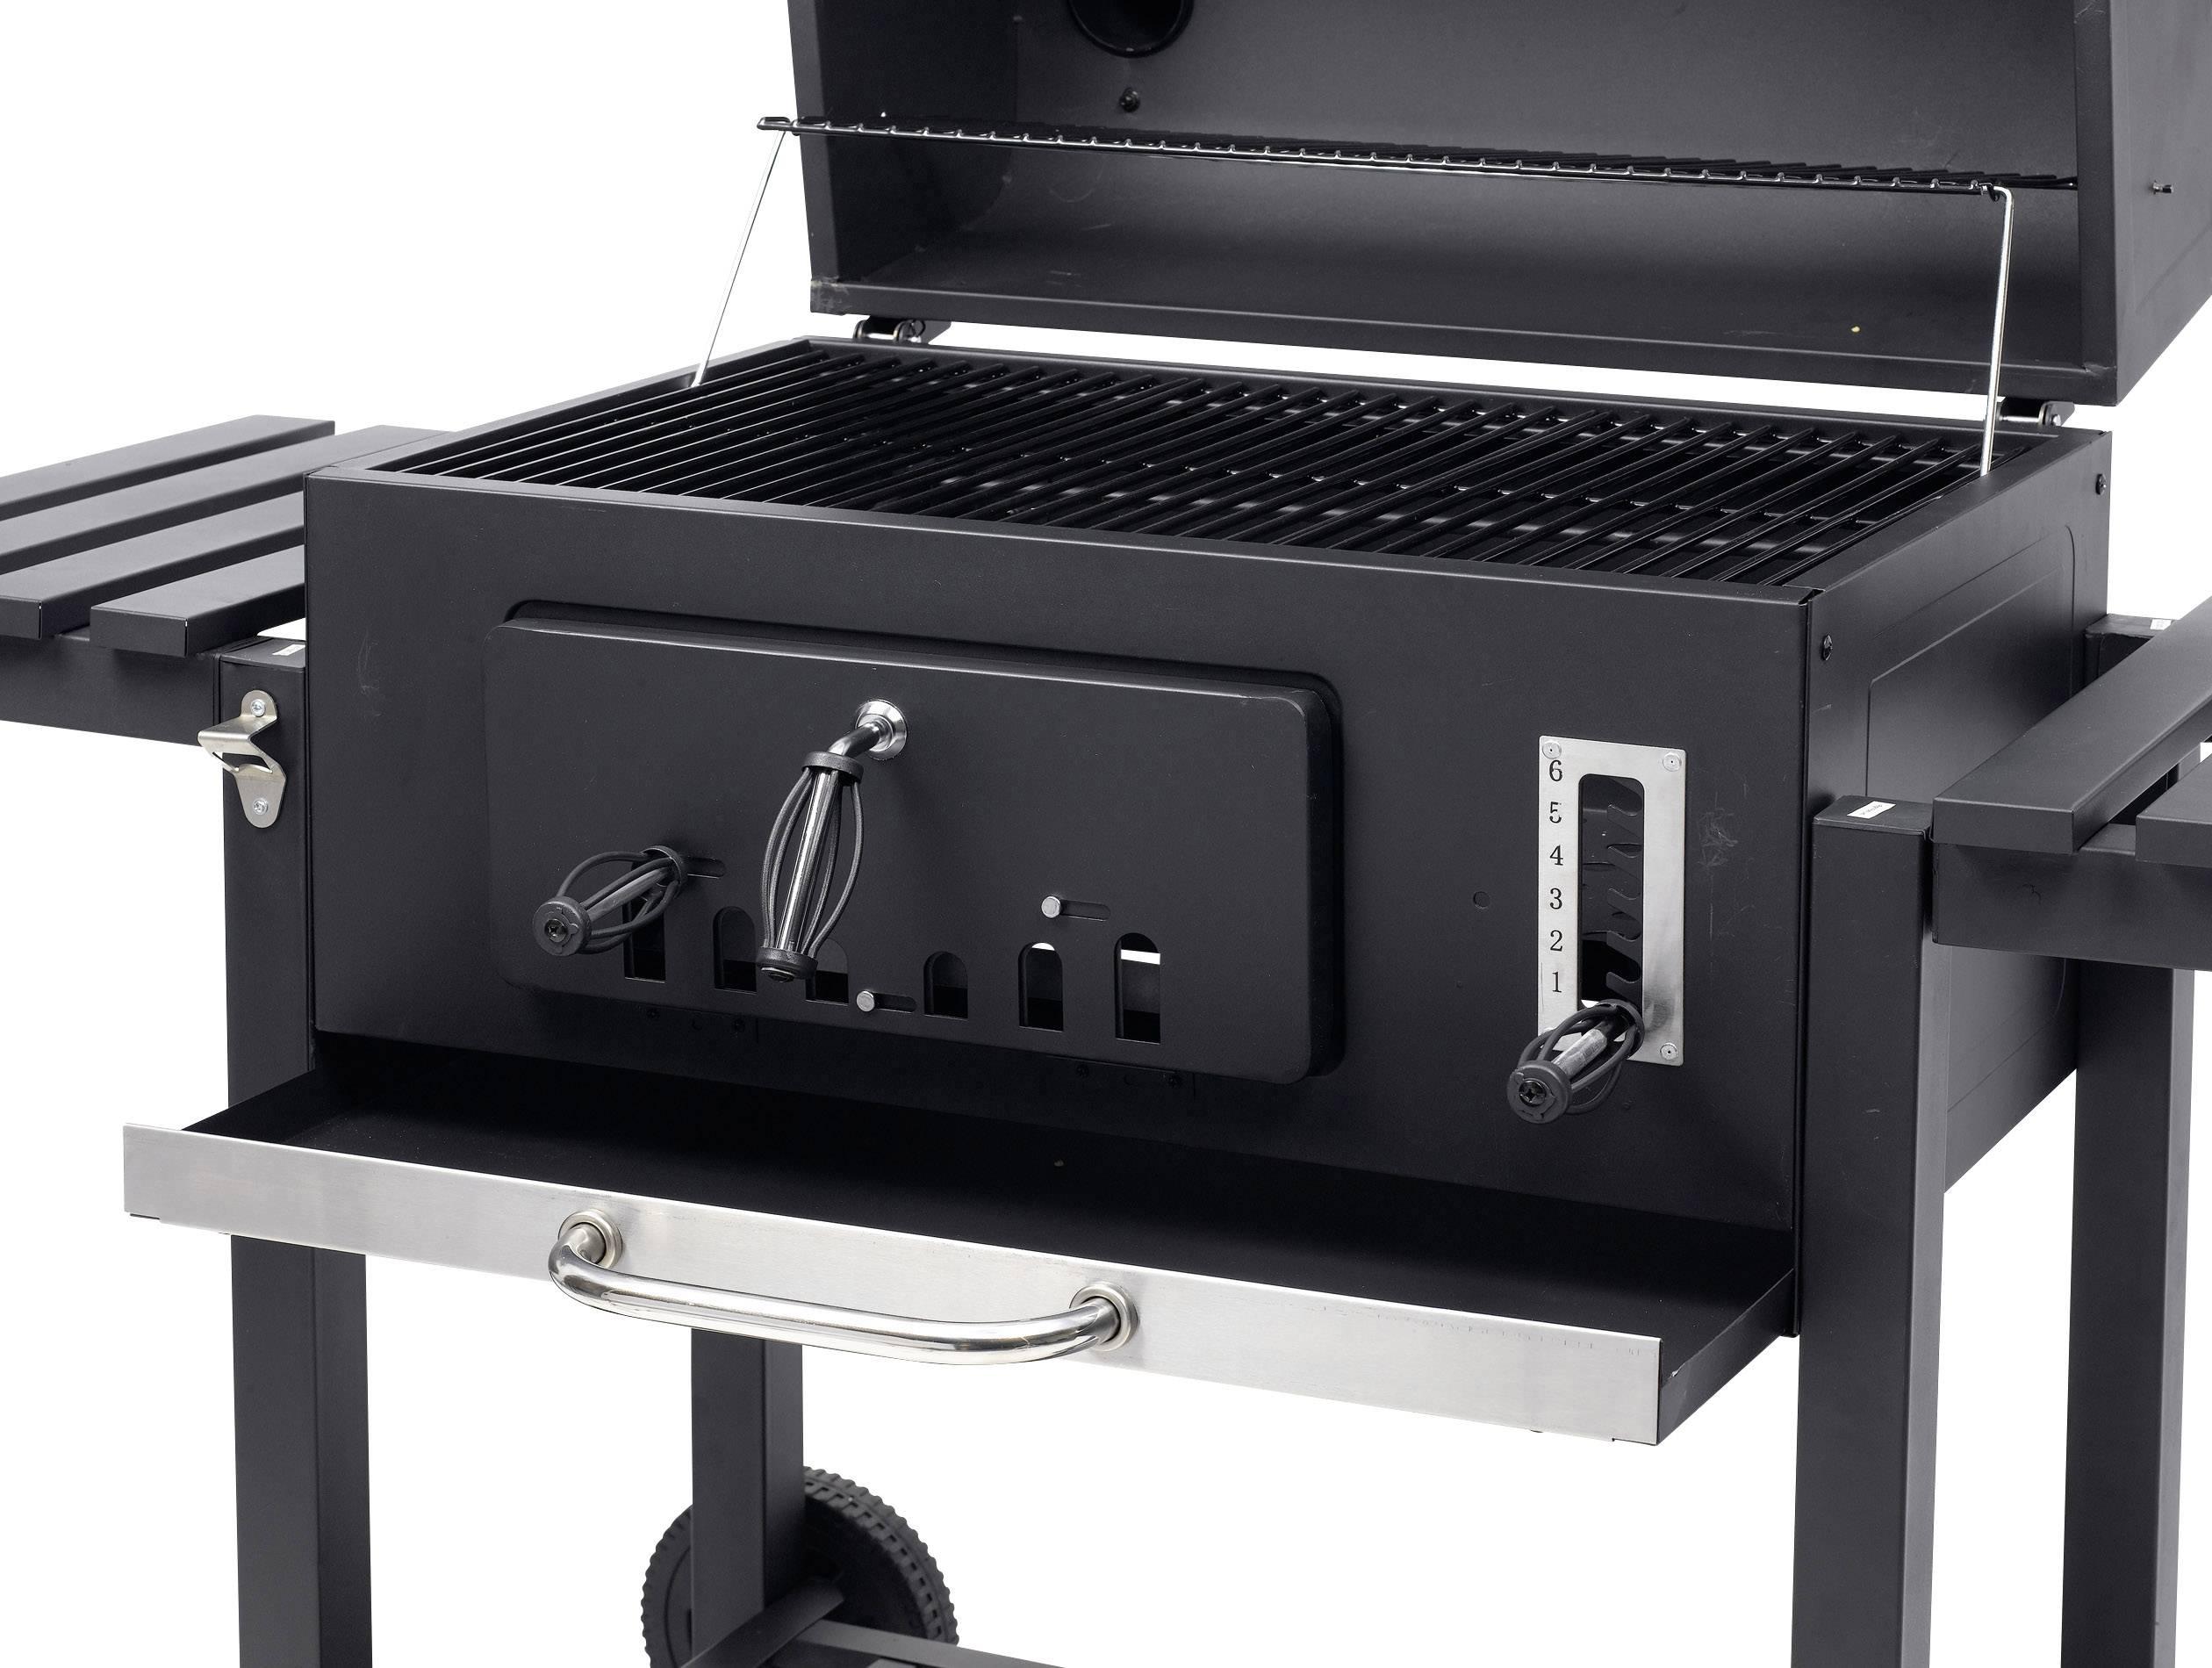 Tepro Holzkohlegrill Toronto Xxl Test : Edelstahl grillrost passend für tepro toronto xxl